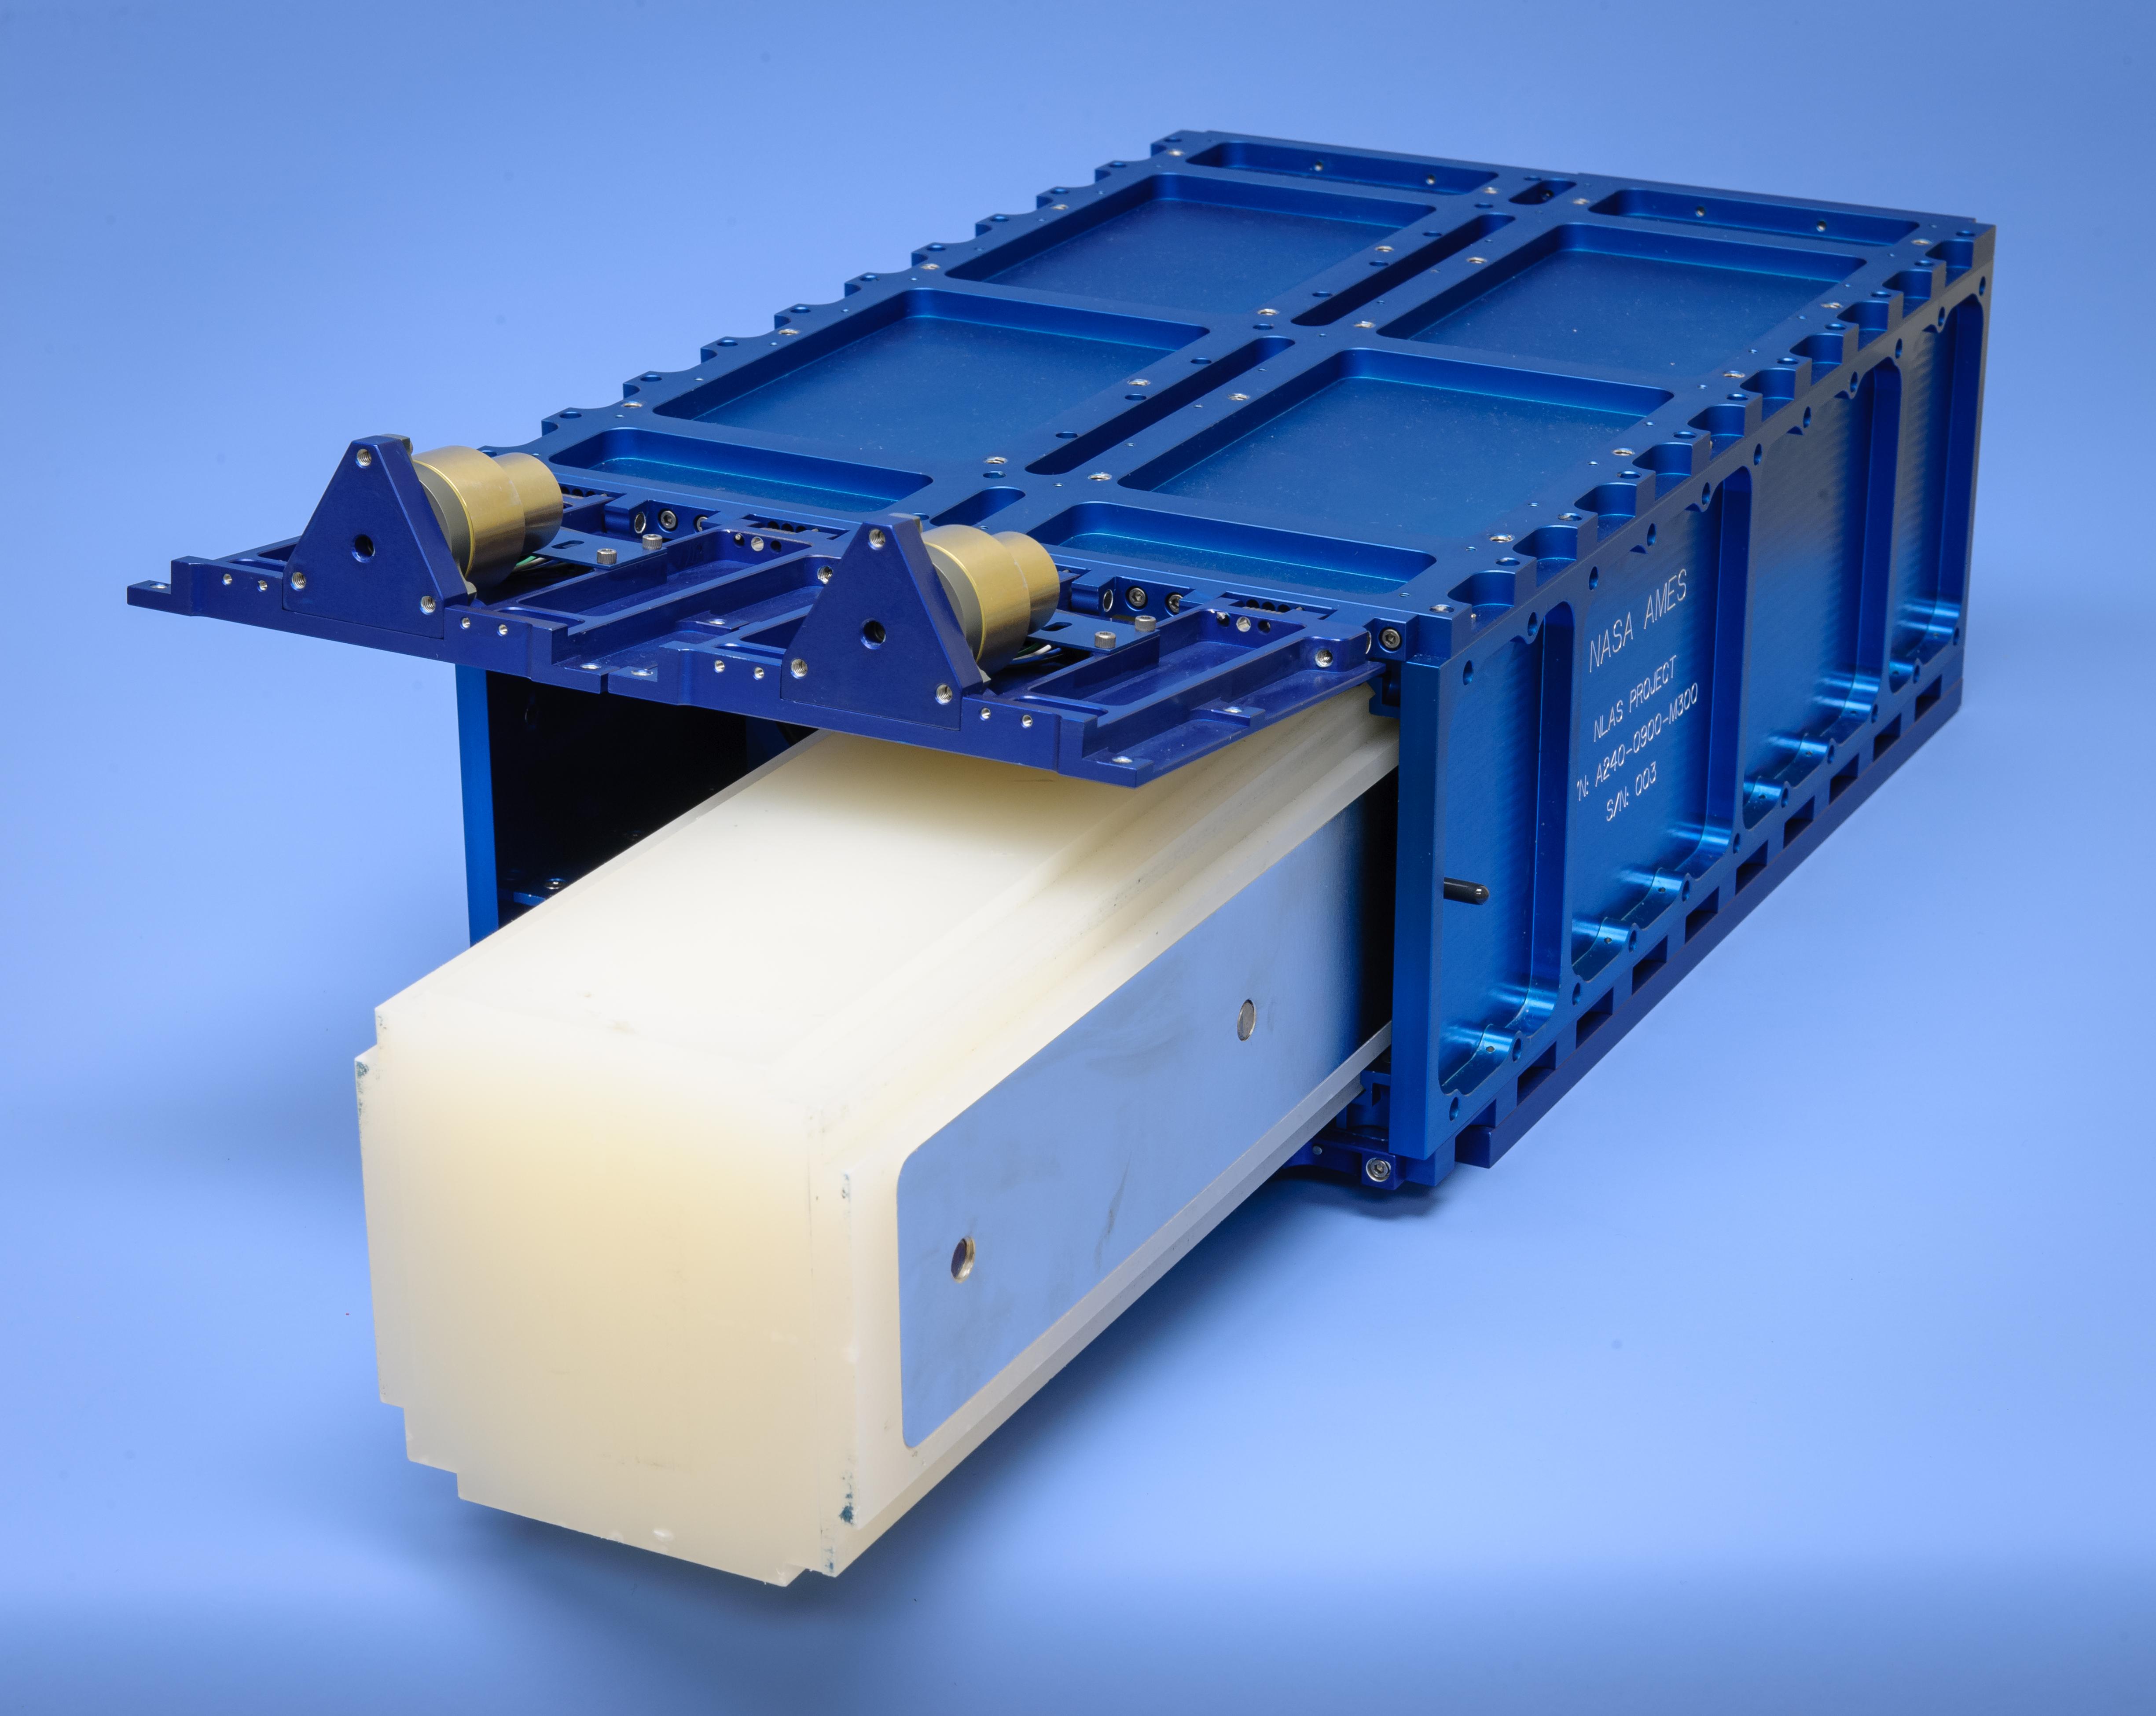 ELaNa VII CubeSat Launch on ORS-4 Mission